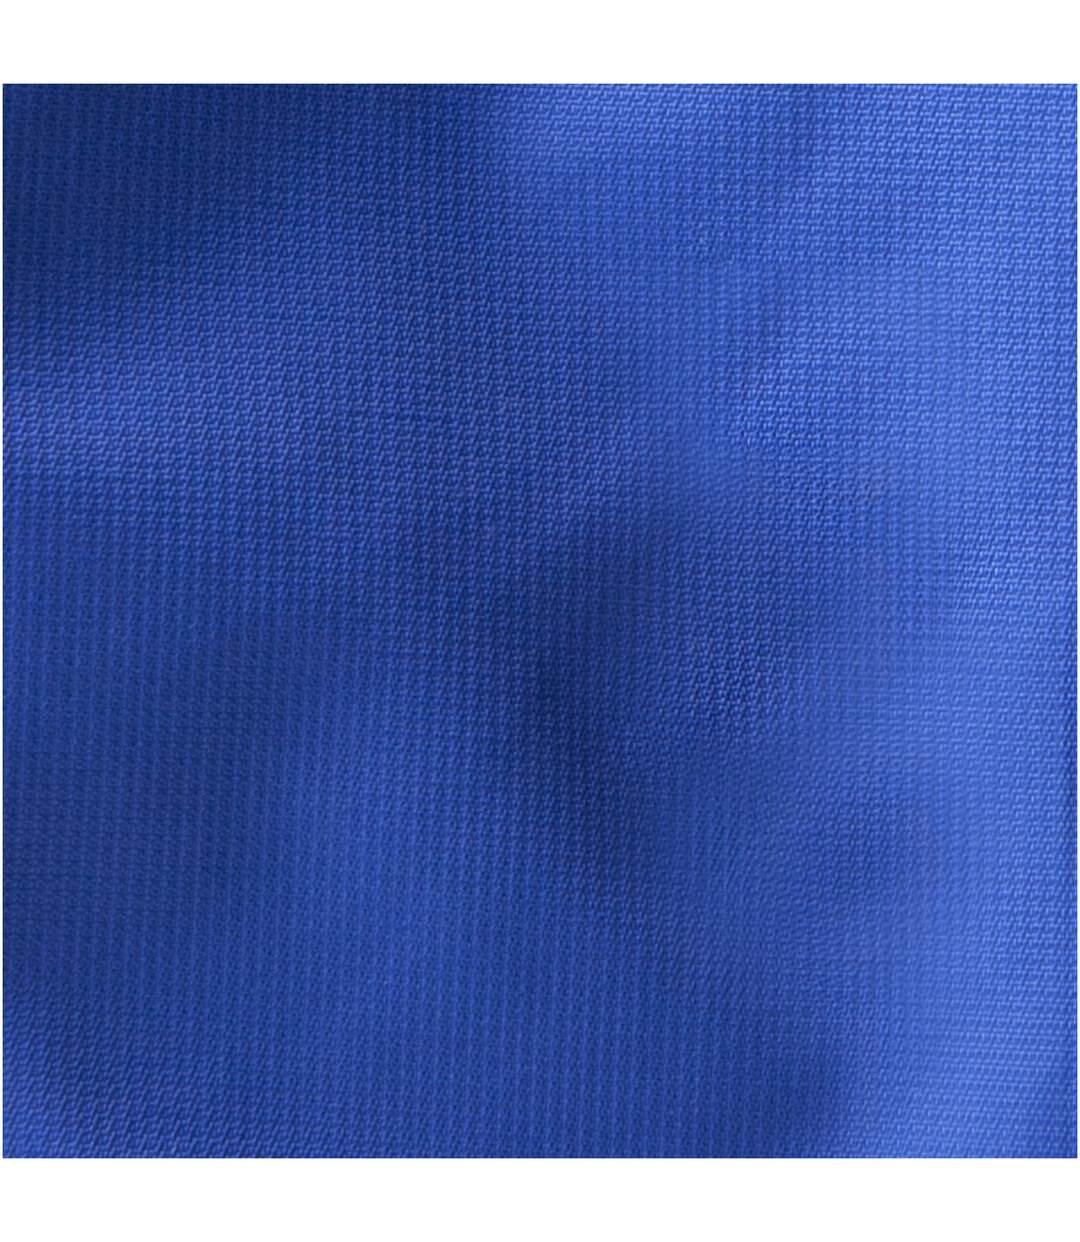 Elevate Mens Labrador Jacket (Blue) - UTPF1899